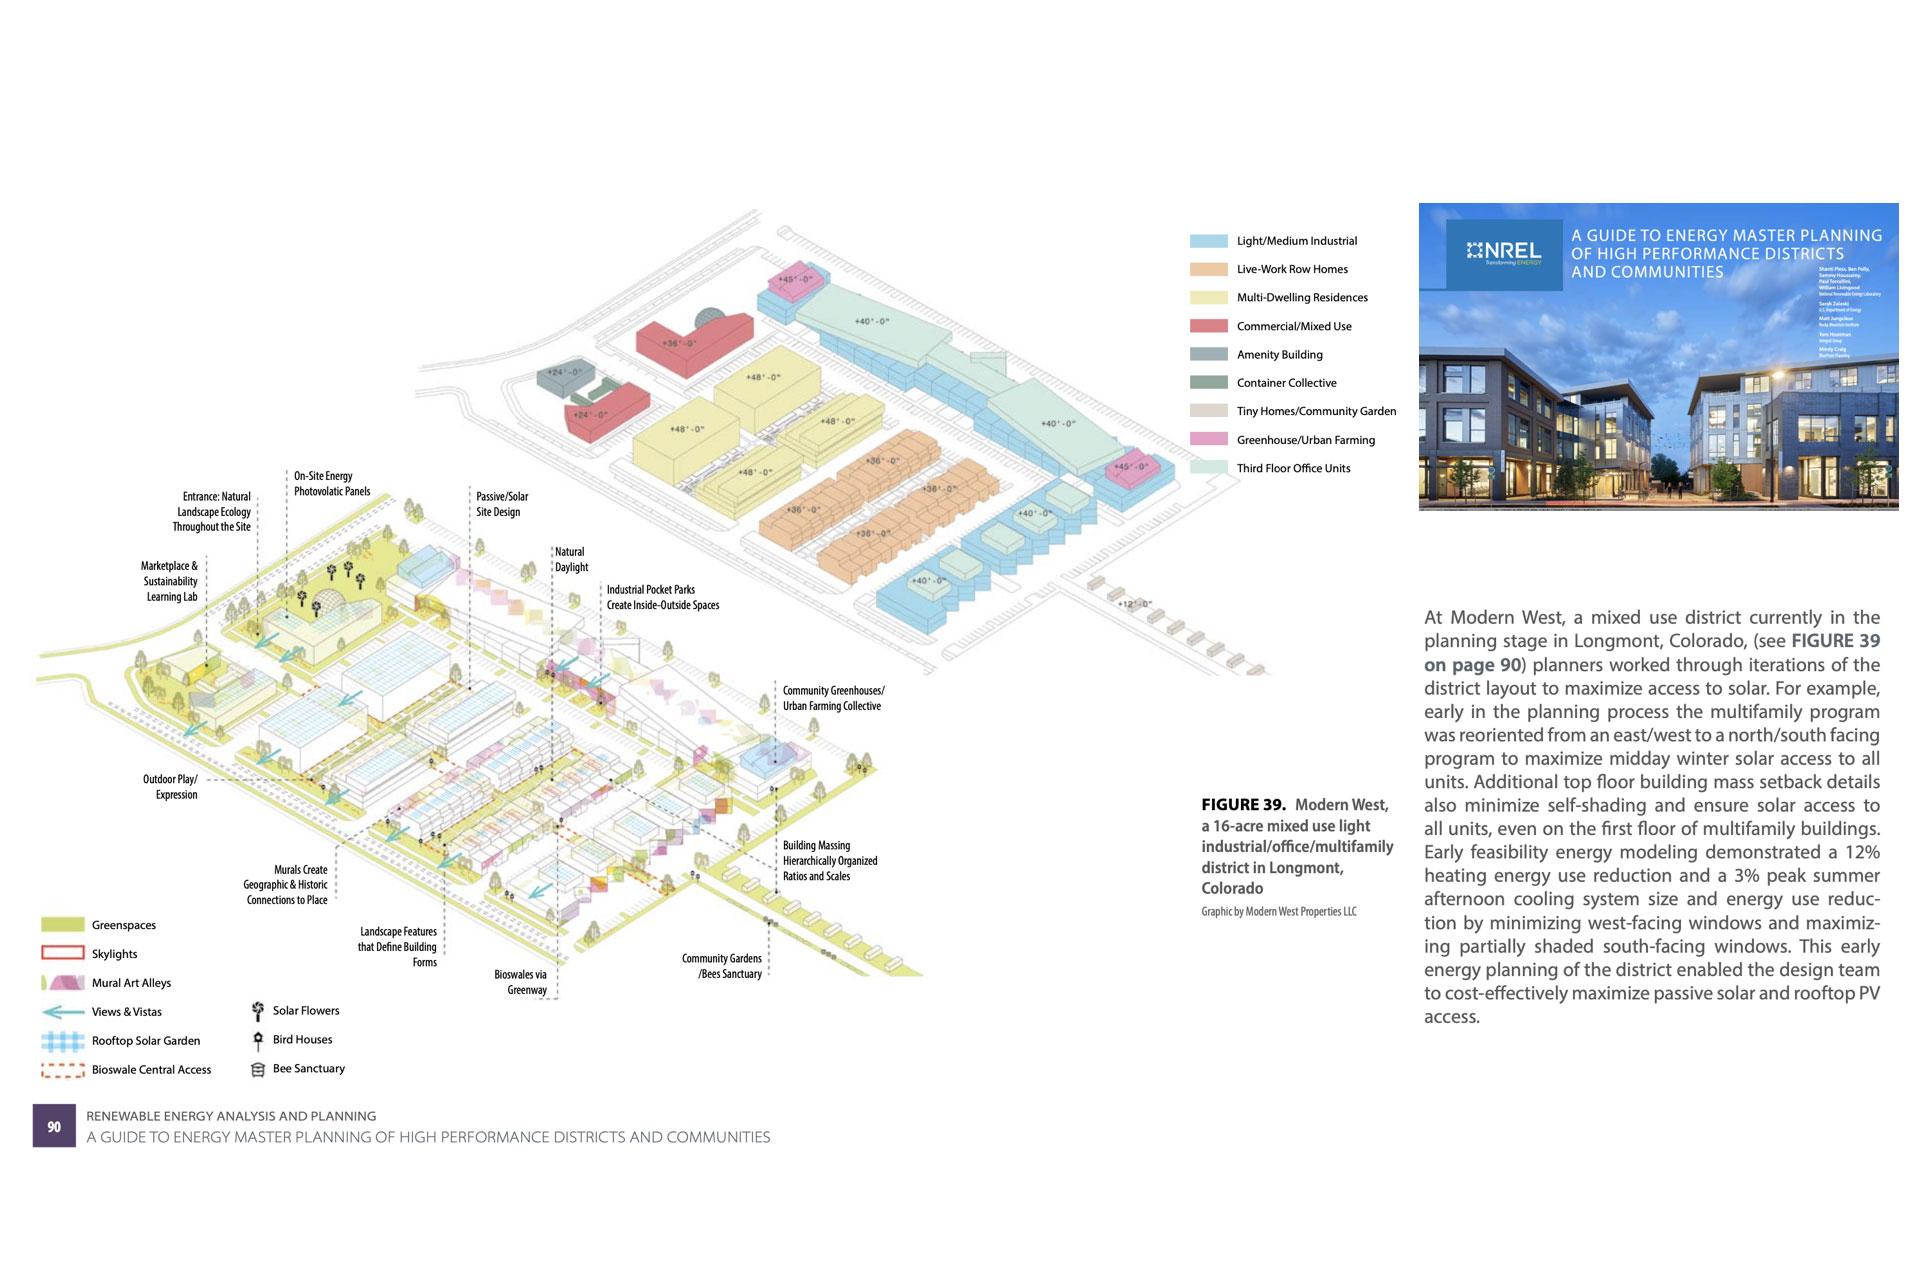 ModernWest layout